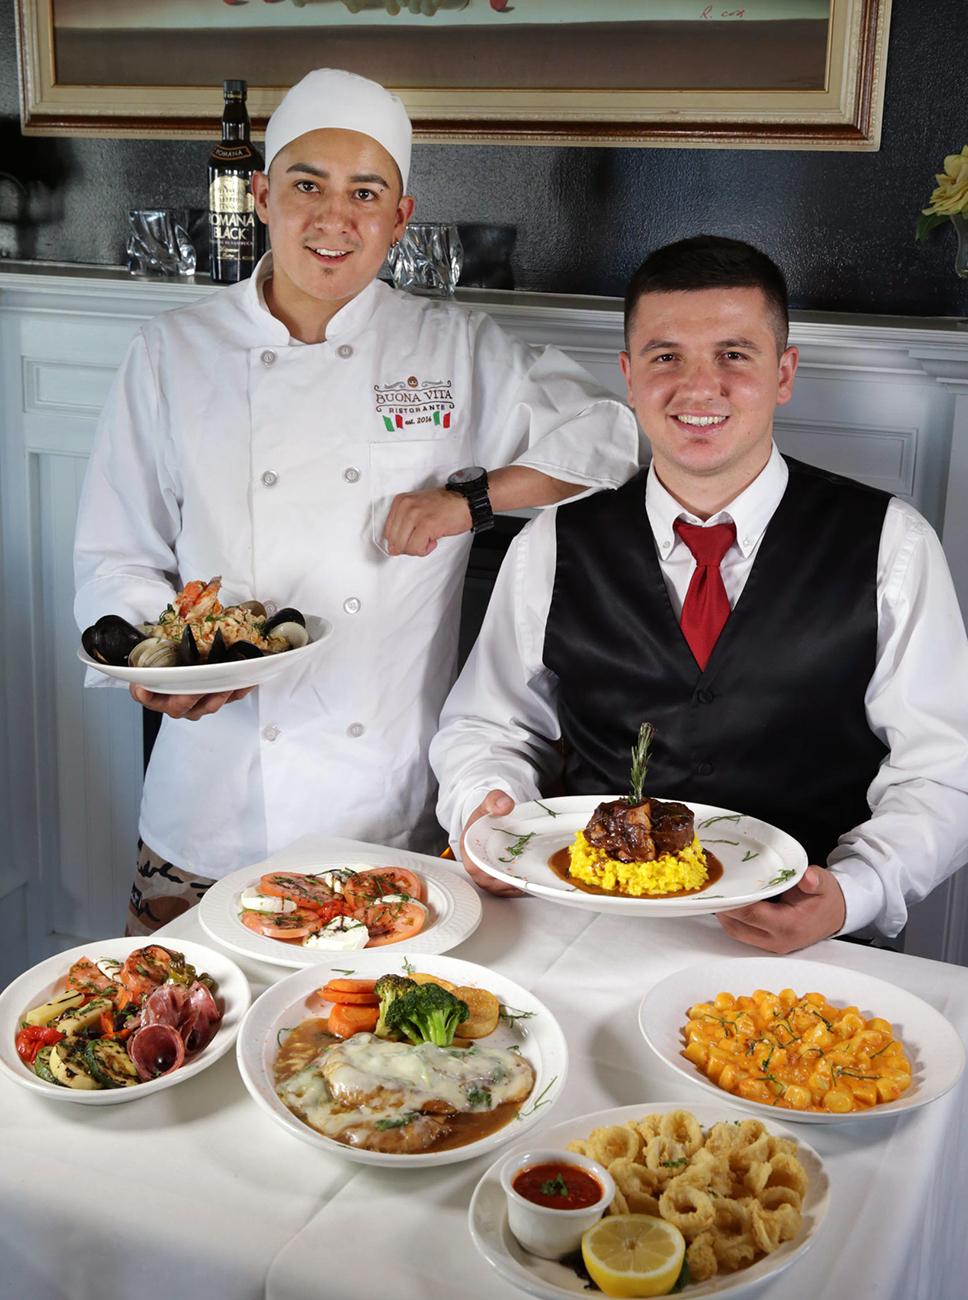 Chef Jose Ramirez, left, and server Mario Kupa, both of Philadelphia, present signature dishes